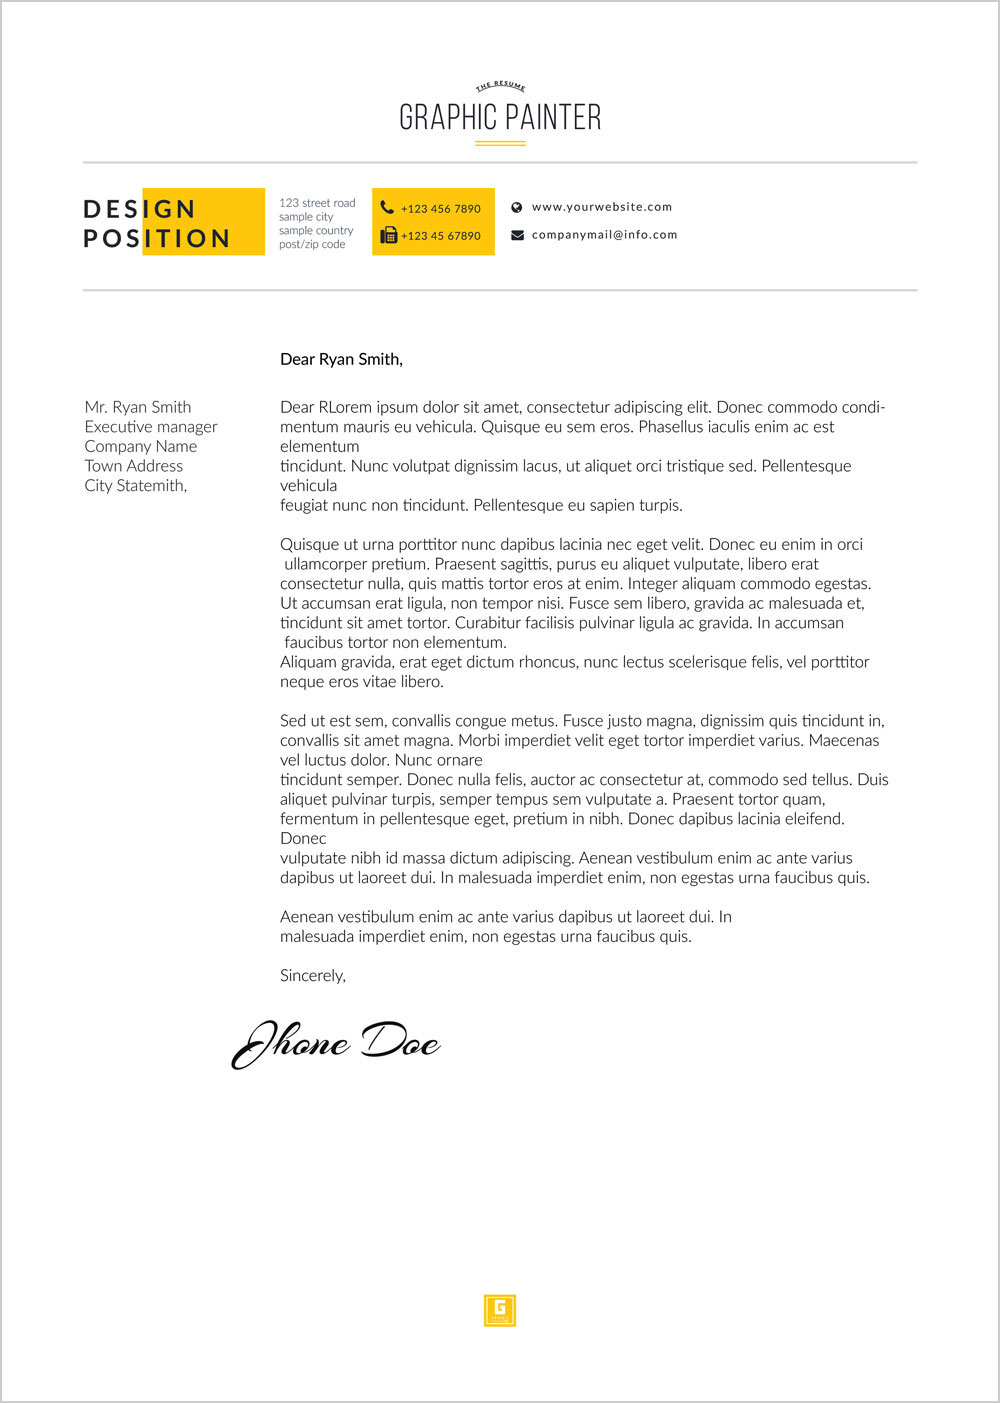 Free-Dark-&-Light-PSD-&-Word-Resume-Template,-Cover-Letter-&-Portfolio-Design (6)